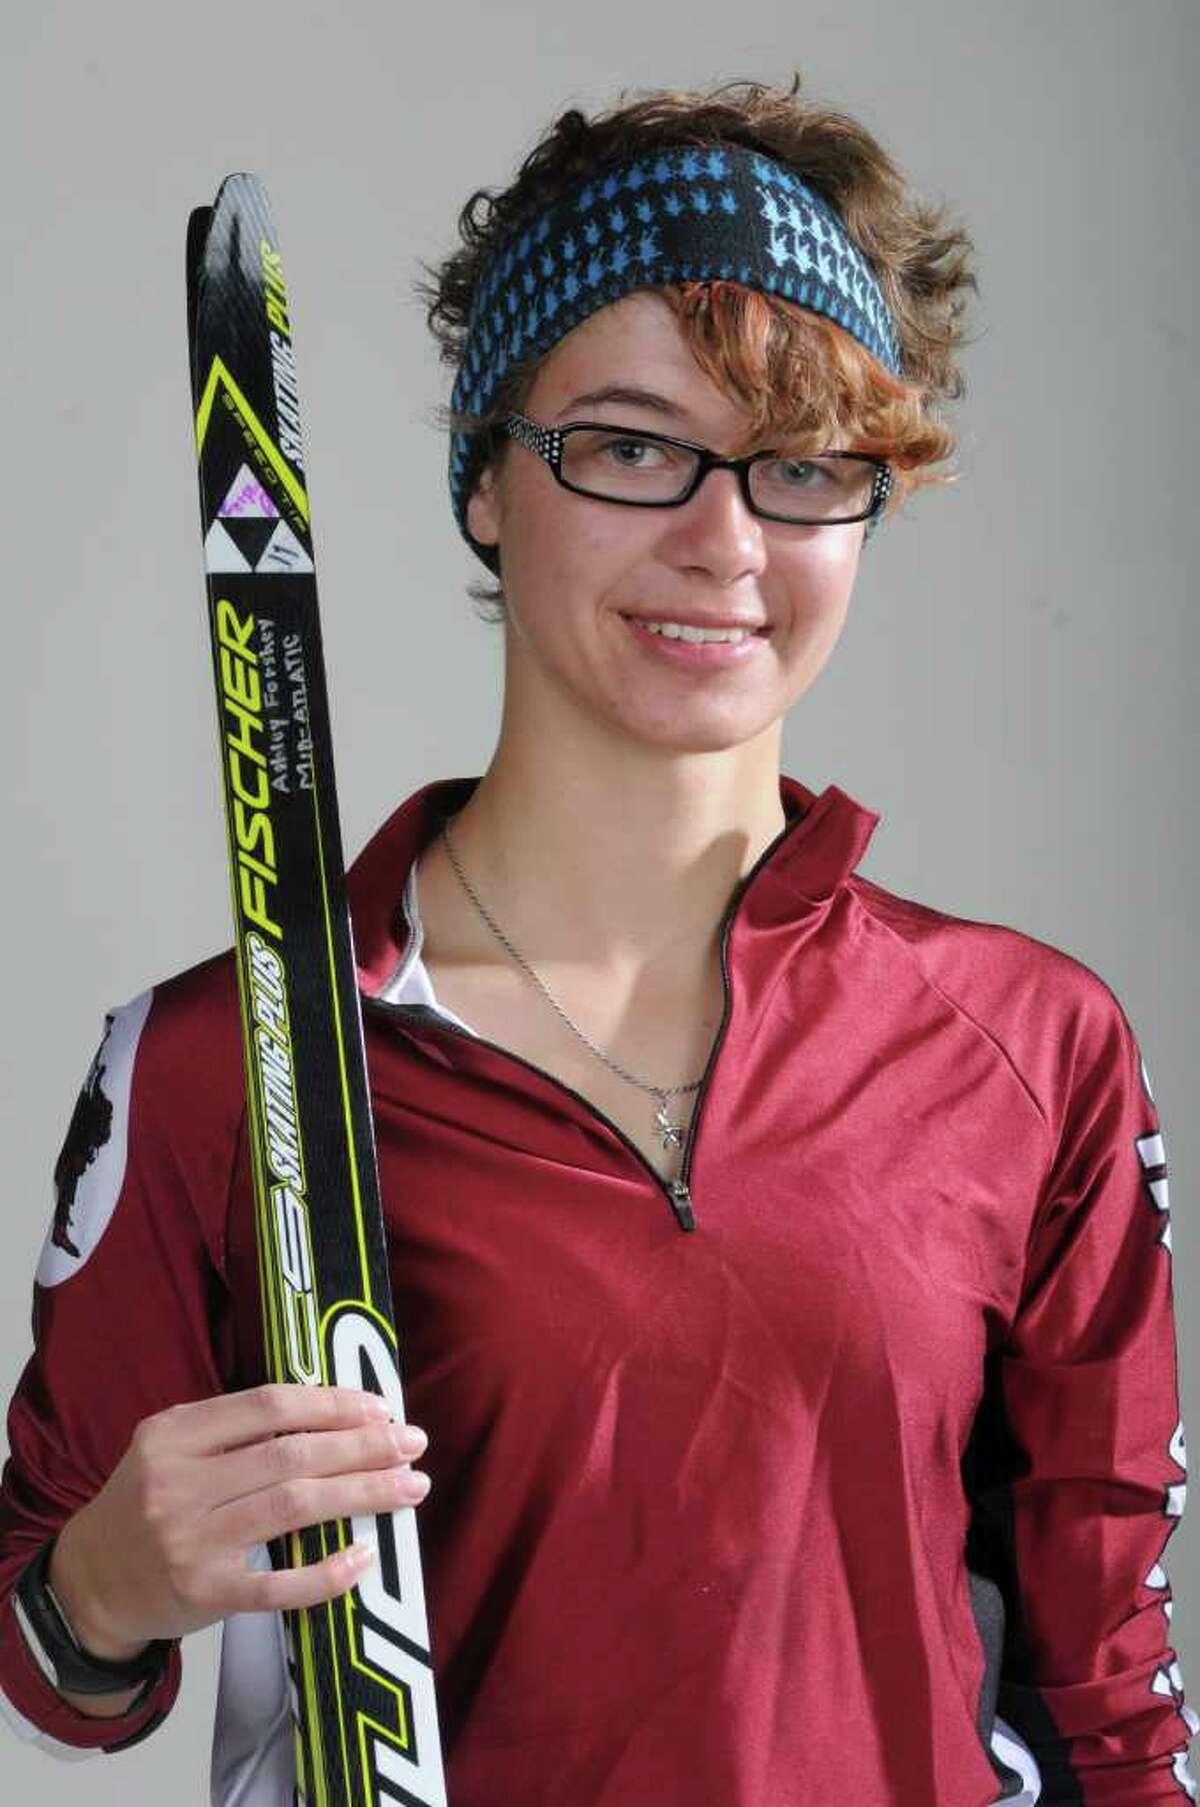 Cross Country skier all-star Ashley Forshey, 18, of Scotia on March 15, 2012 in Colonie, N.Y. (Lori Van Buren / Times Union)